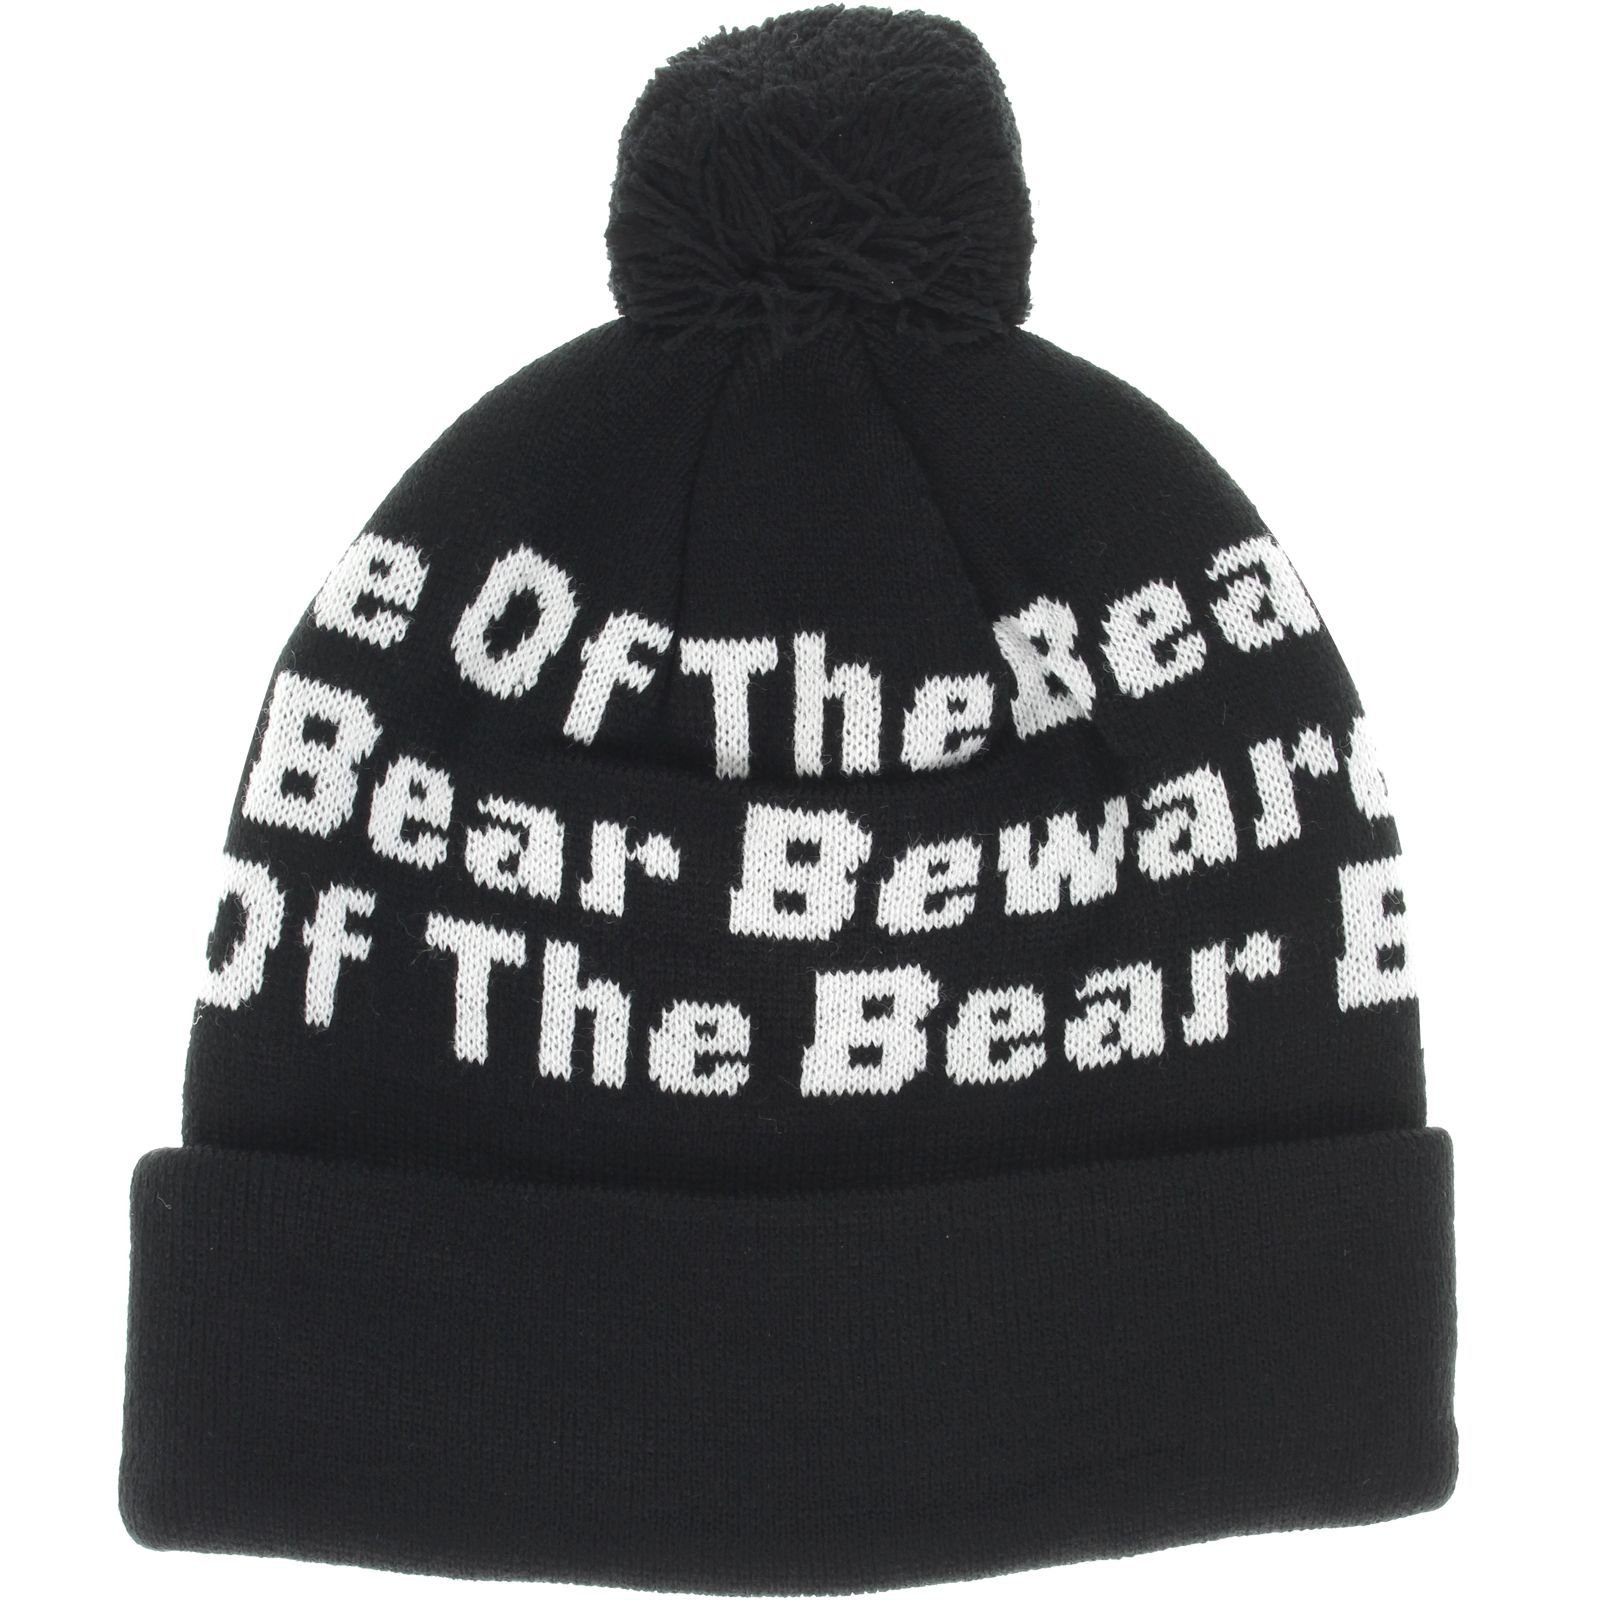 Grizzly BOTB Pom Beanie Black